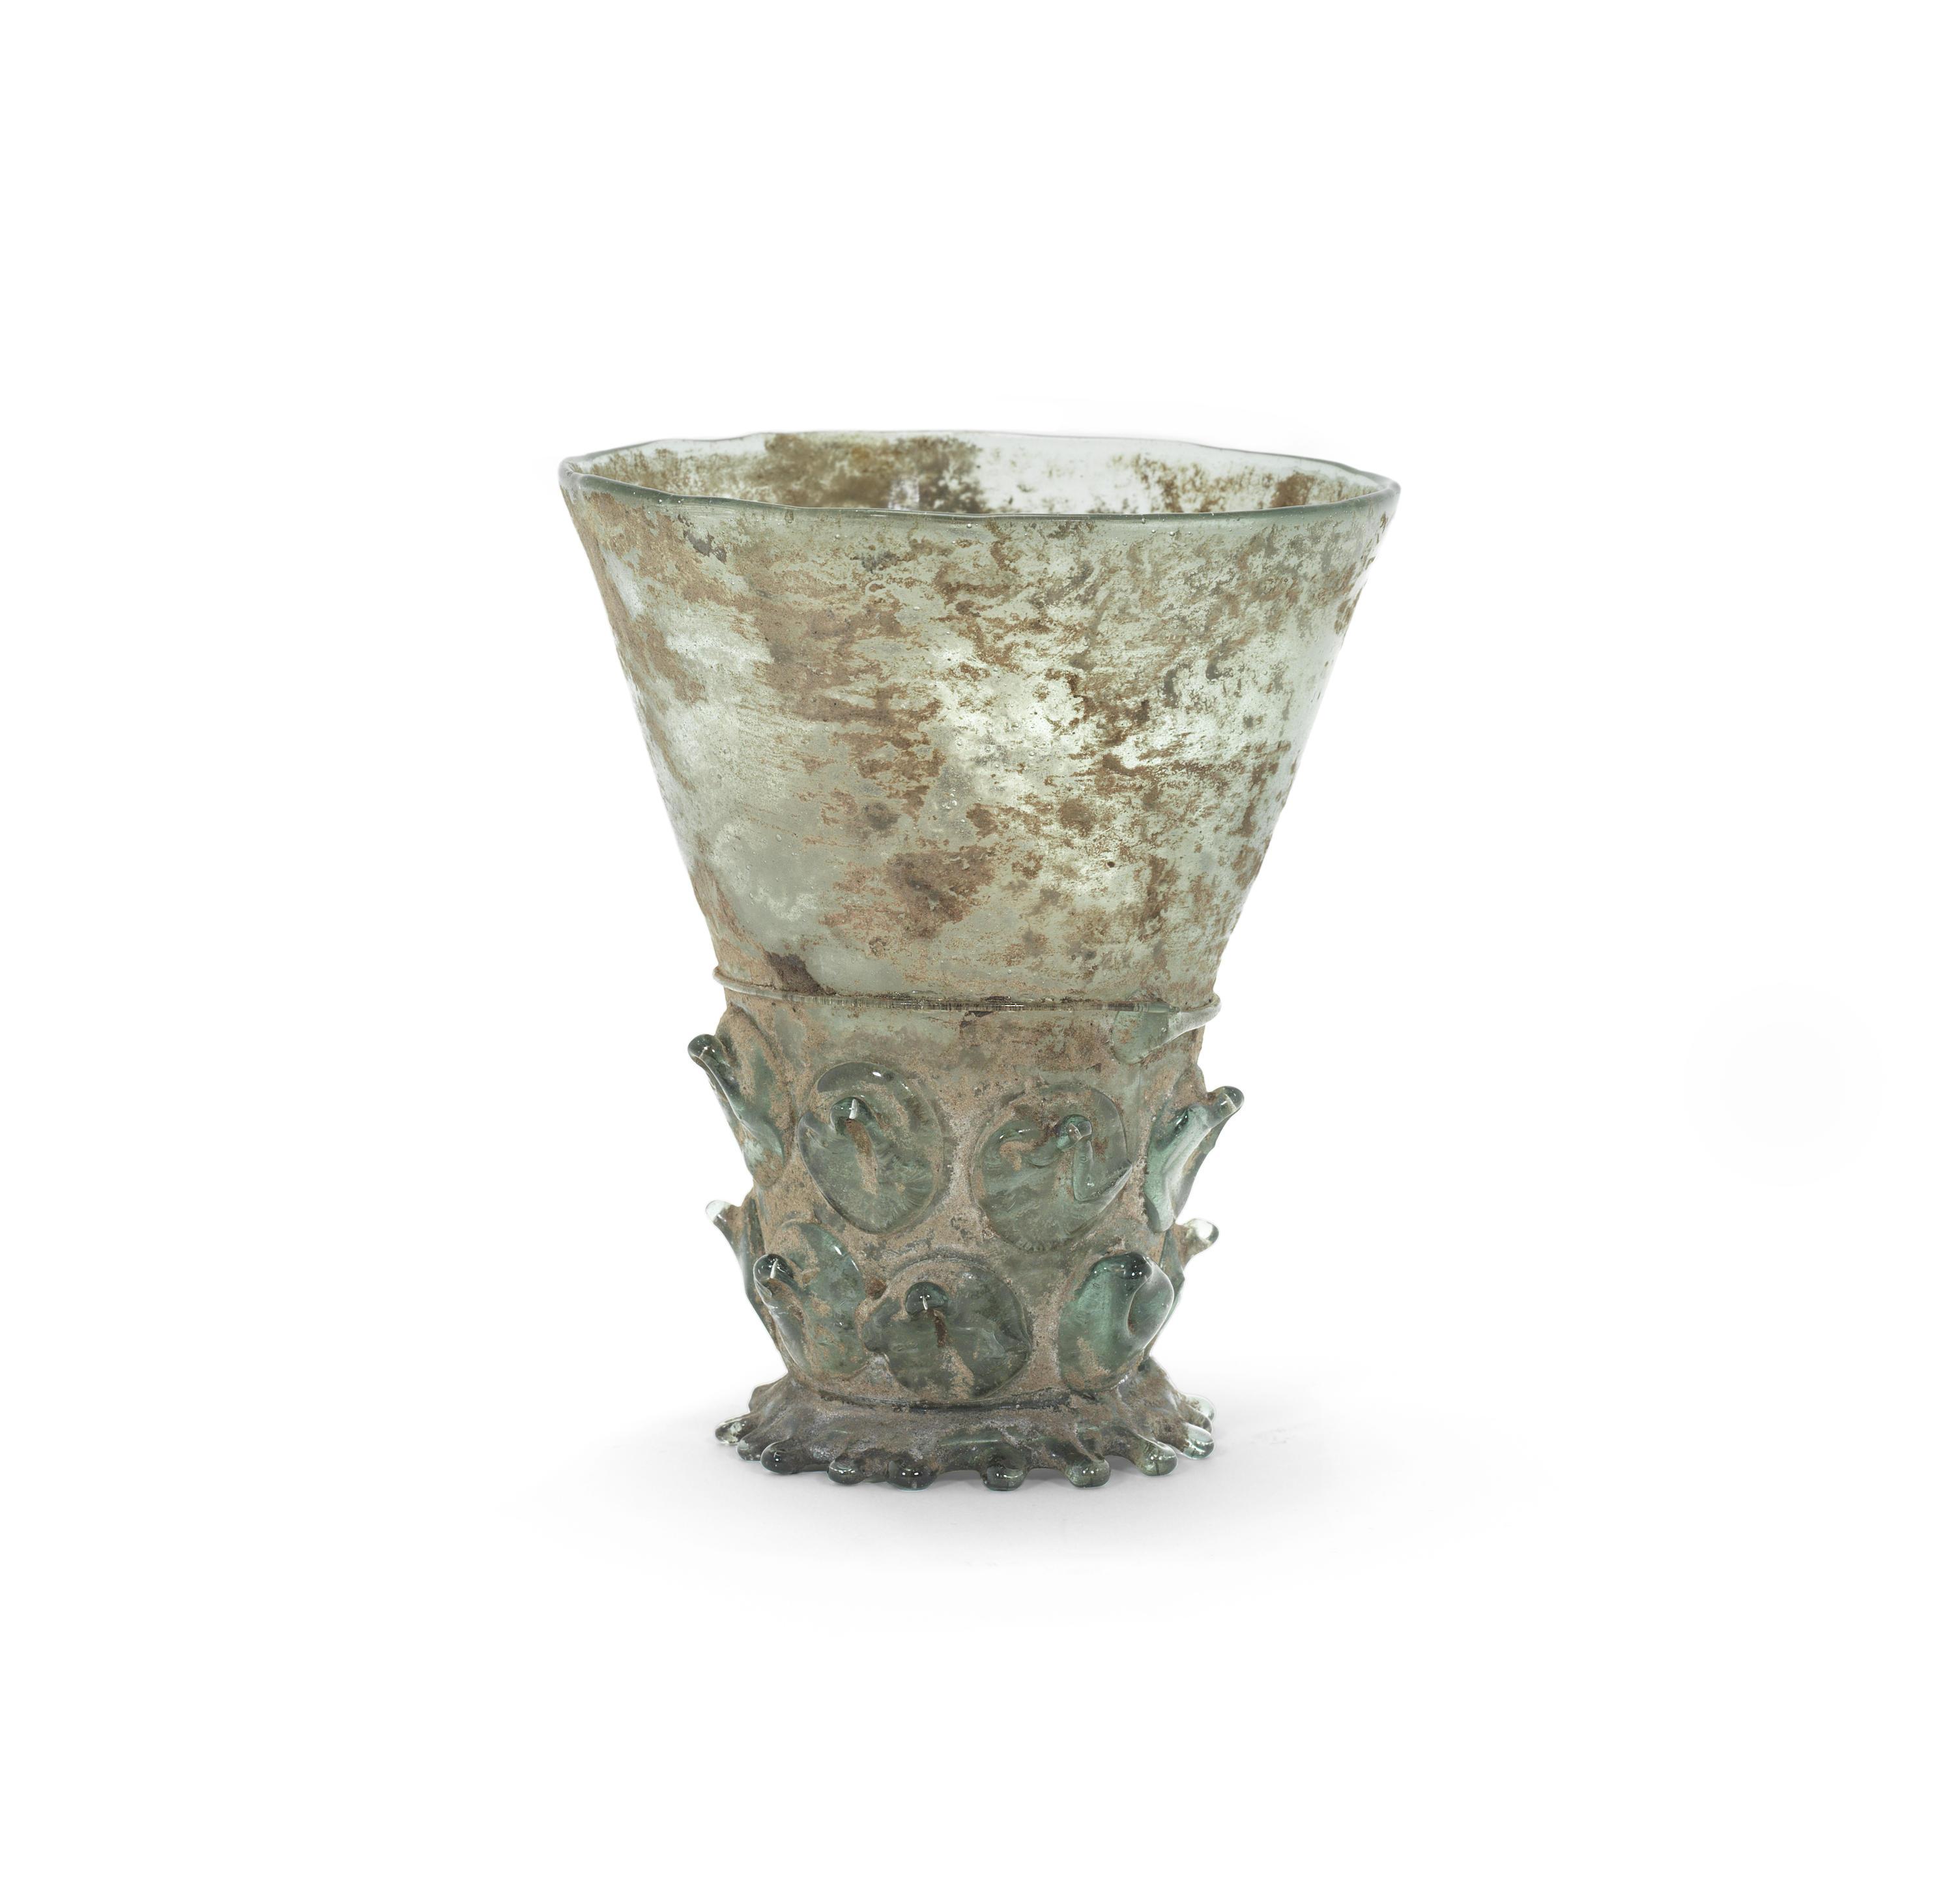 Fine Glass and British Ceramics